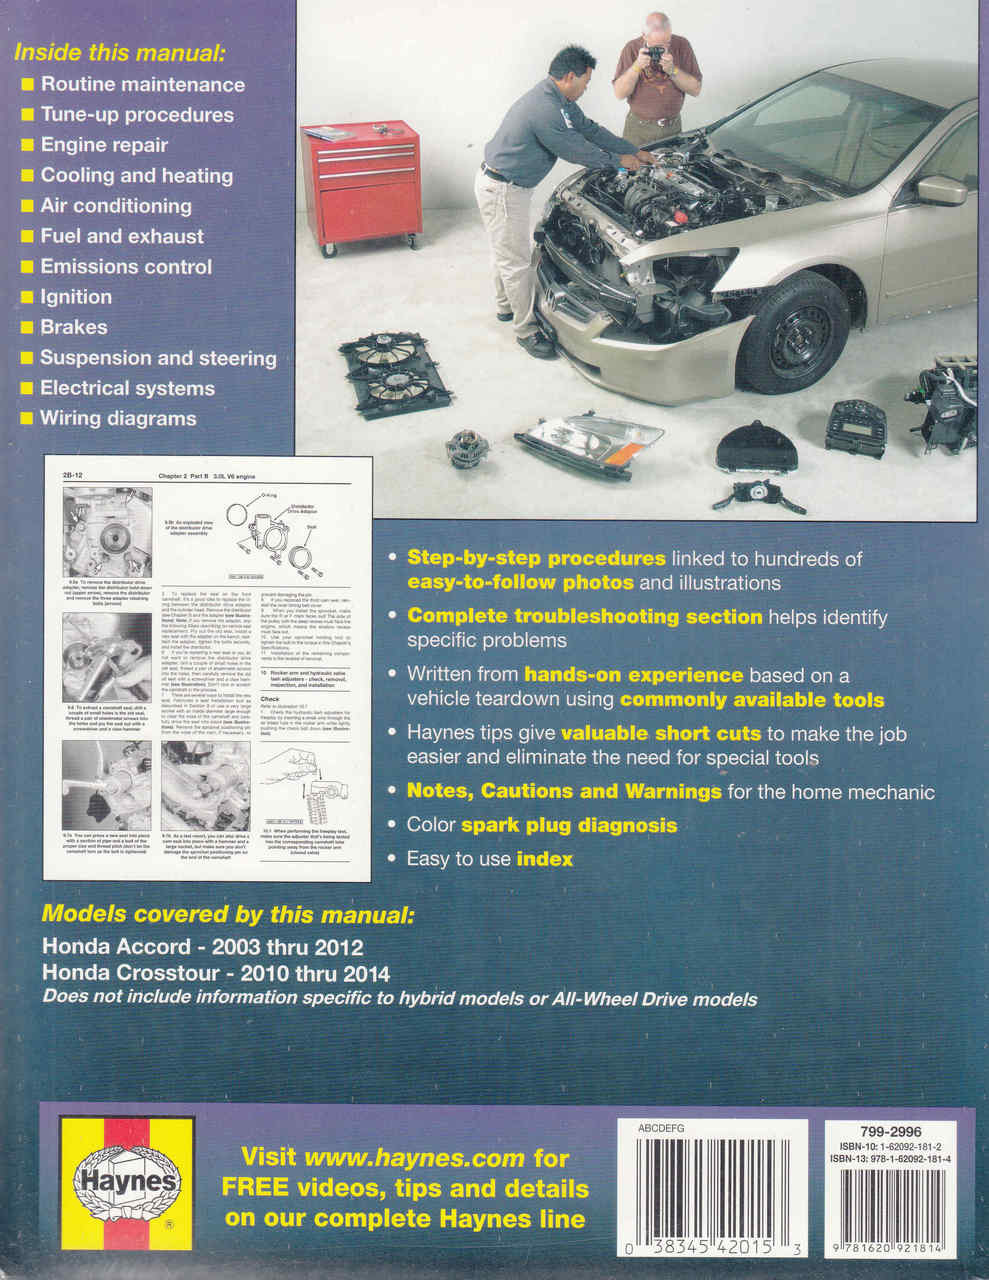 591 Honda Accord Crosstour 2003 2012 Workshop Manual Wiring Library